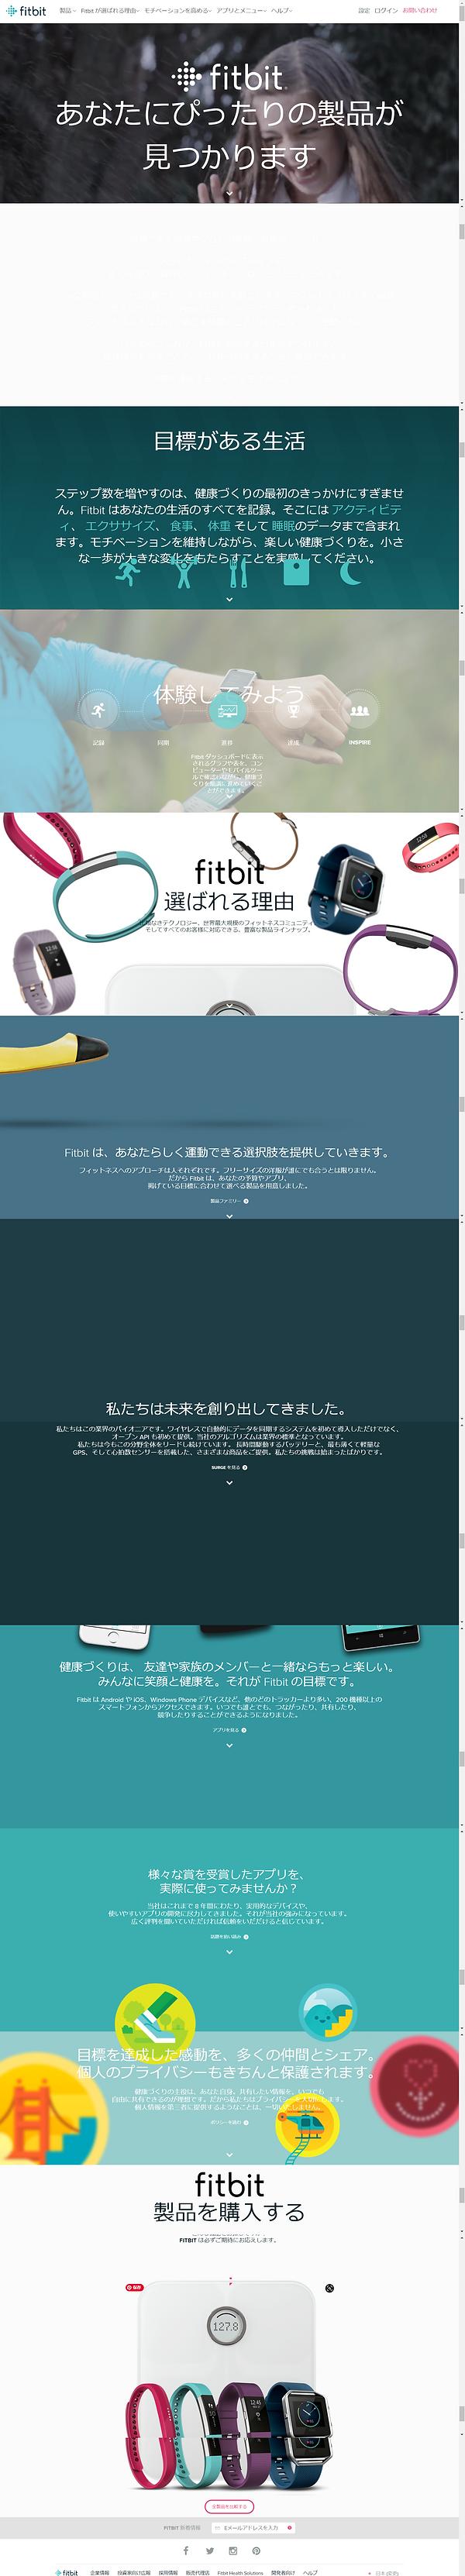 Screenshot - 2021-01-16T124614.403.png